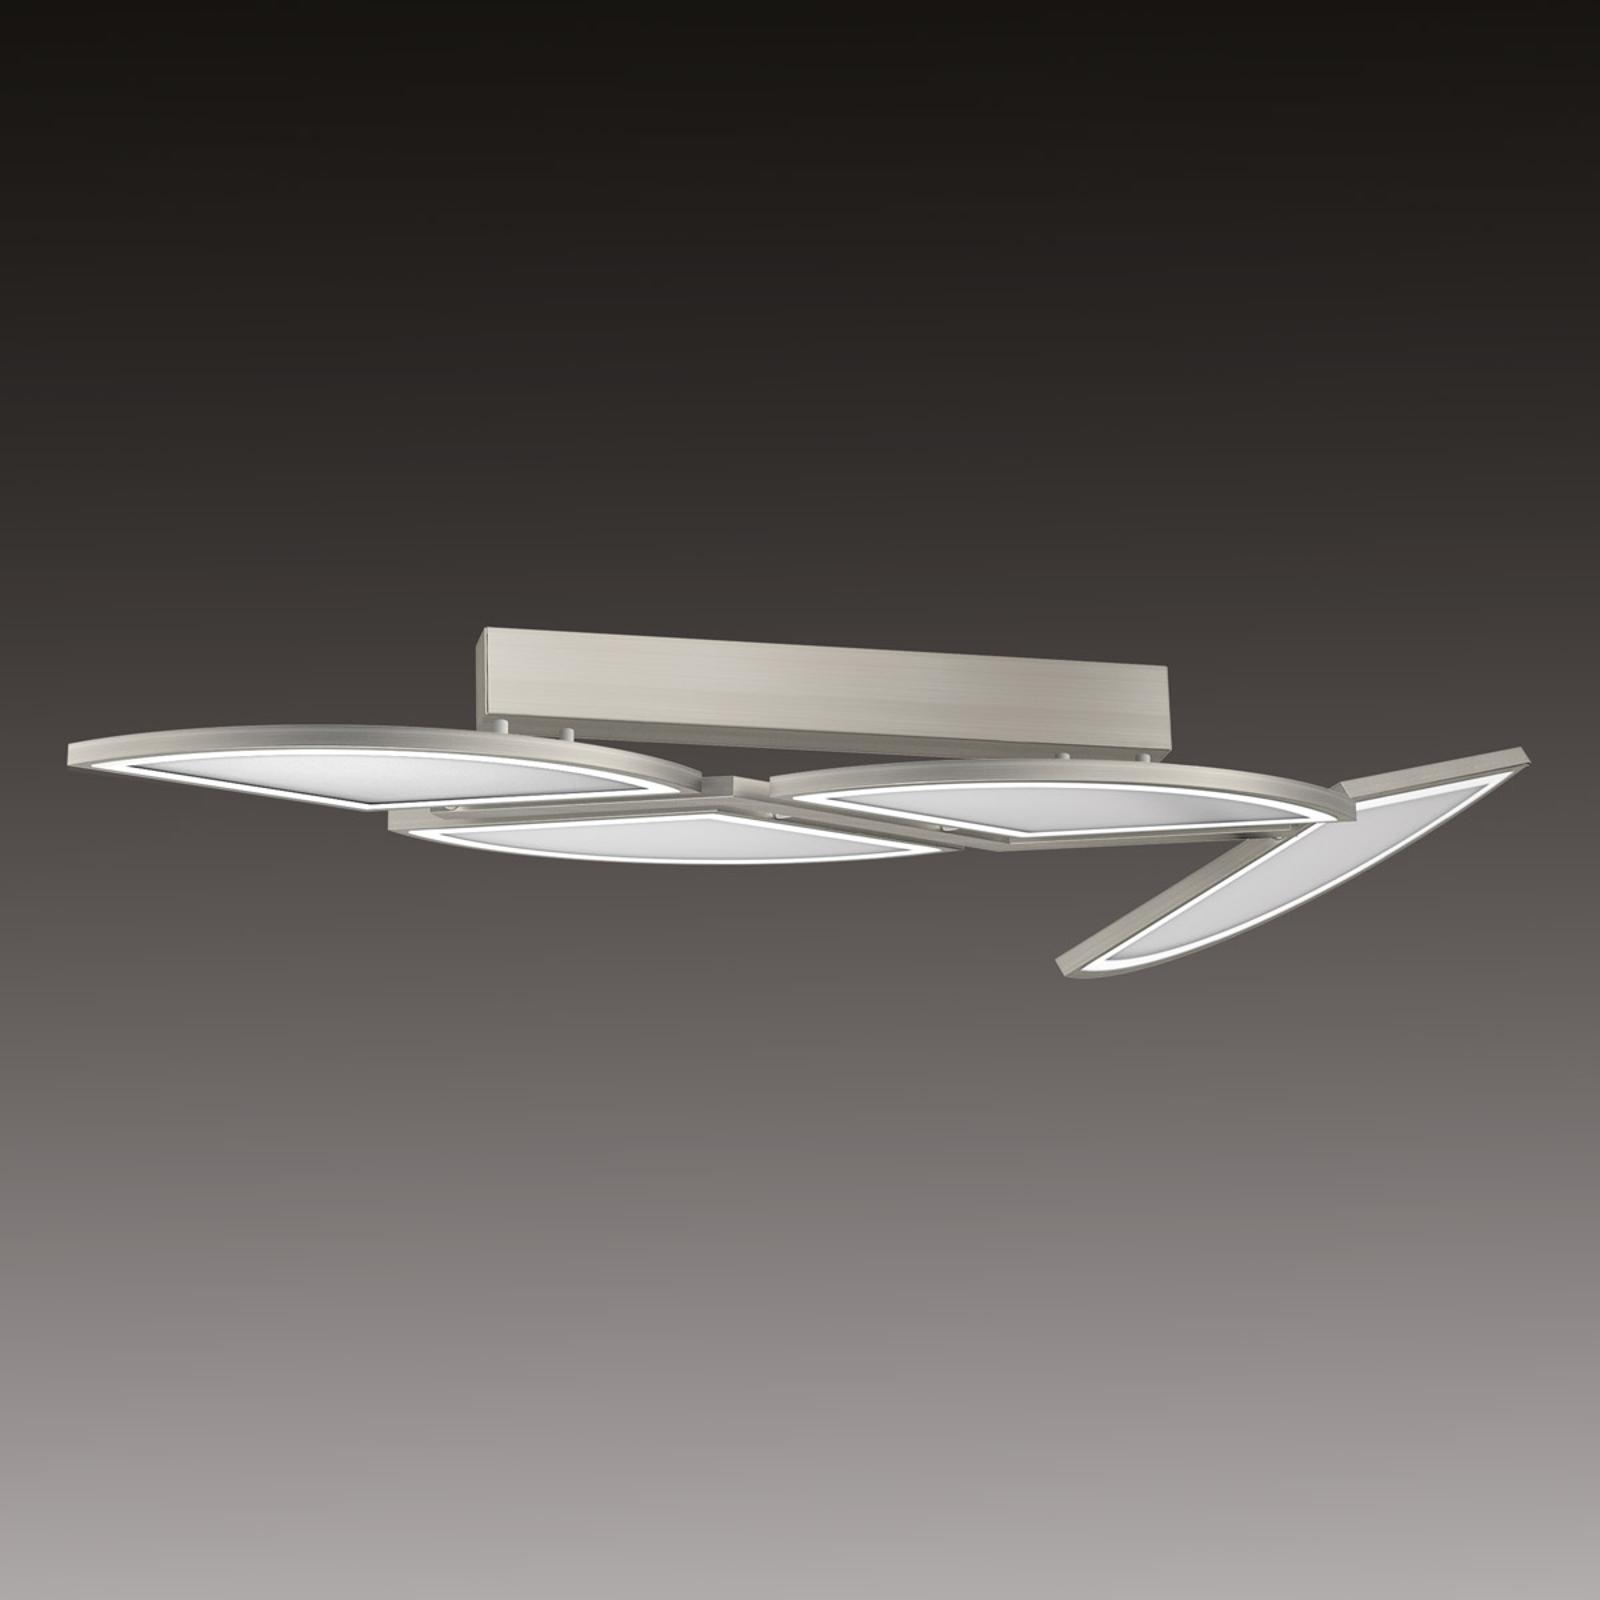 Movil - Lámpara LED de techo, 4 segmentos de luz